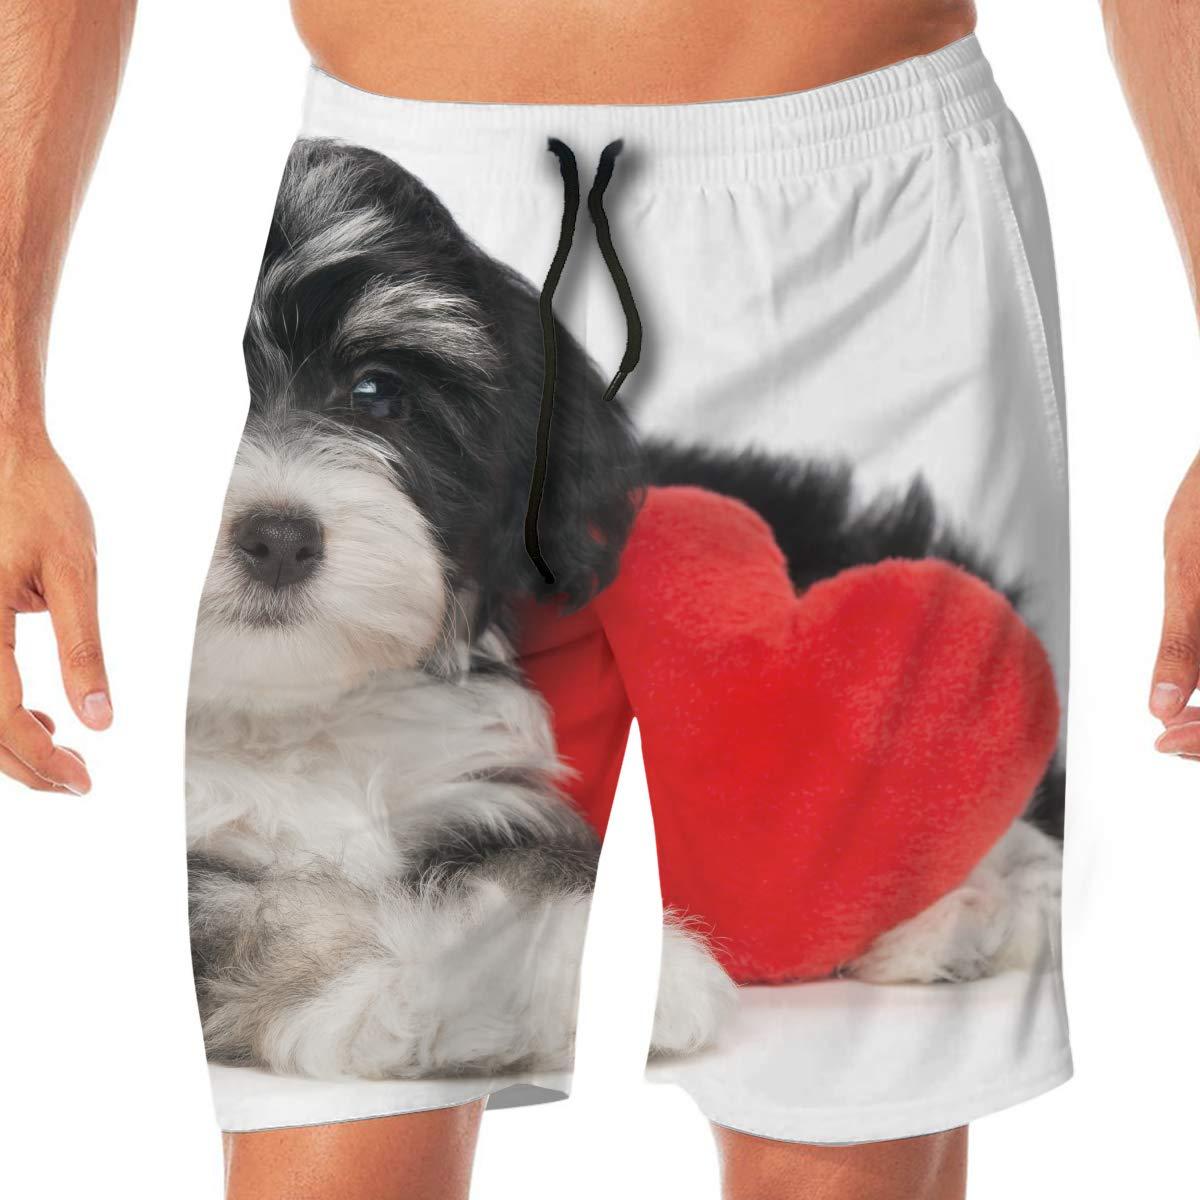 BEAQ45 Mens Summer Quick Dry Swim Trunks Dog Heart Printing Boardshort